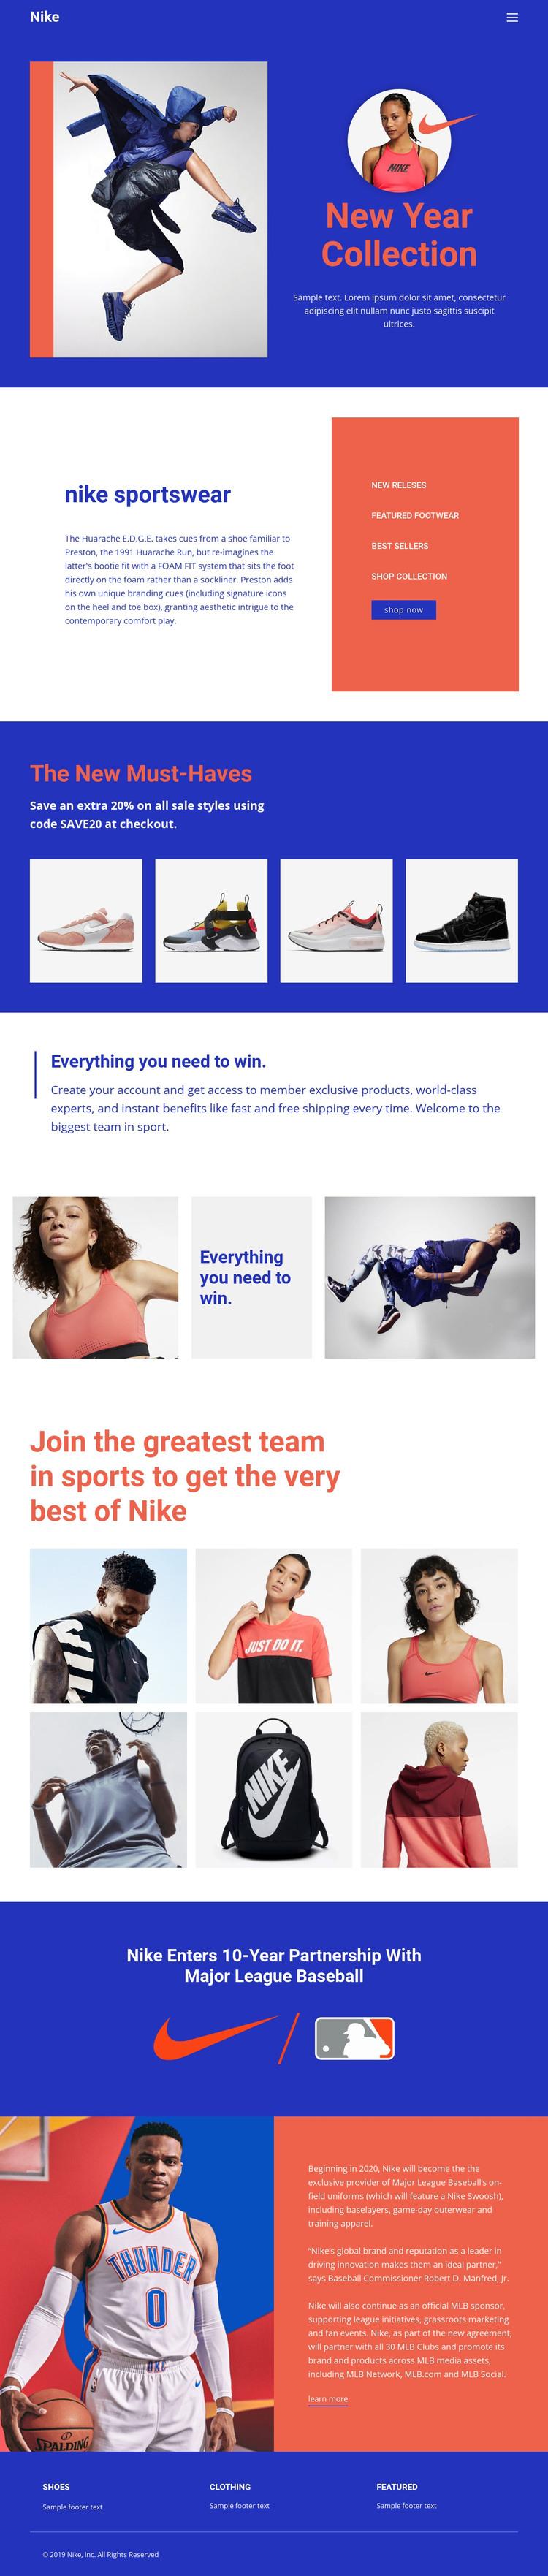 Nike sportwear Homepage Design